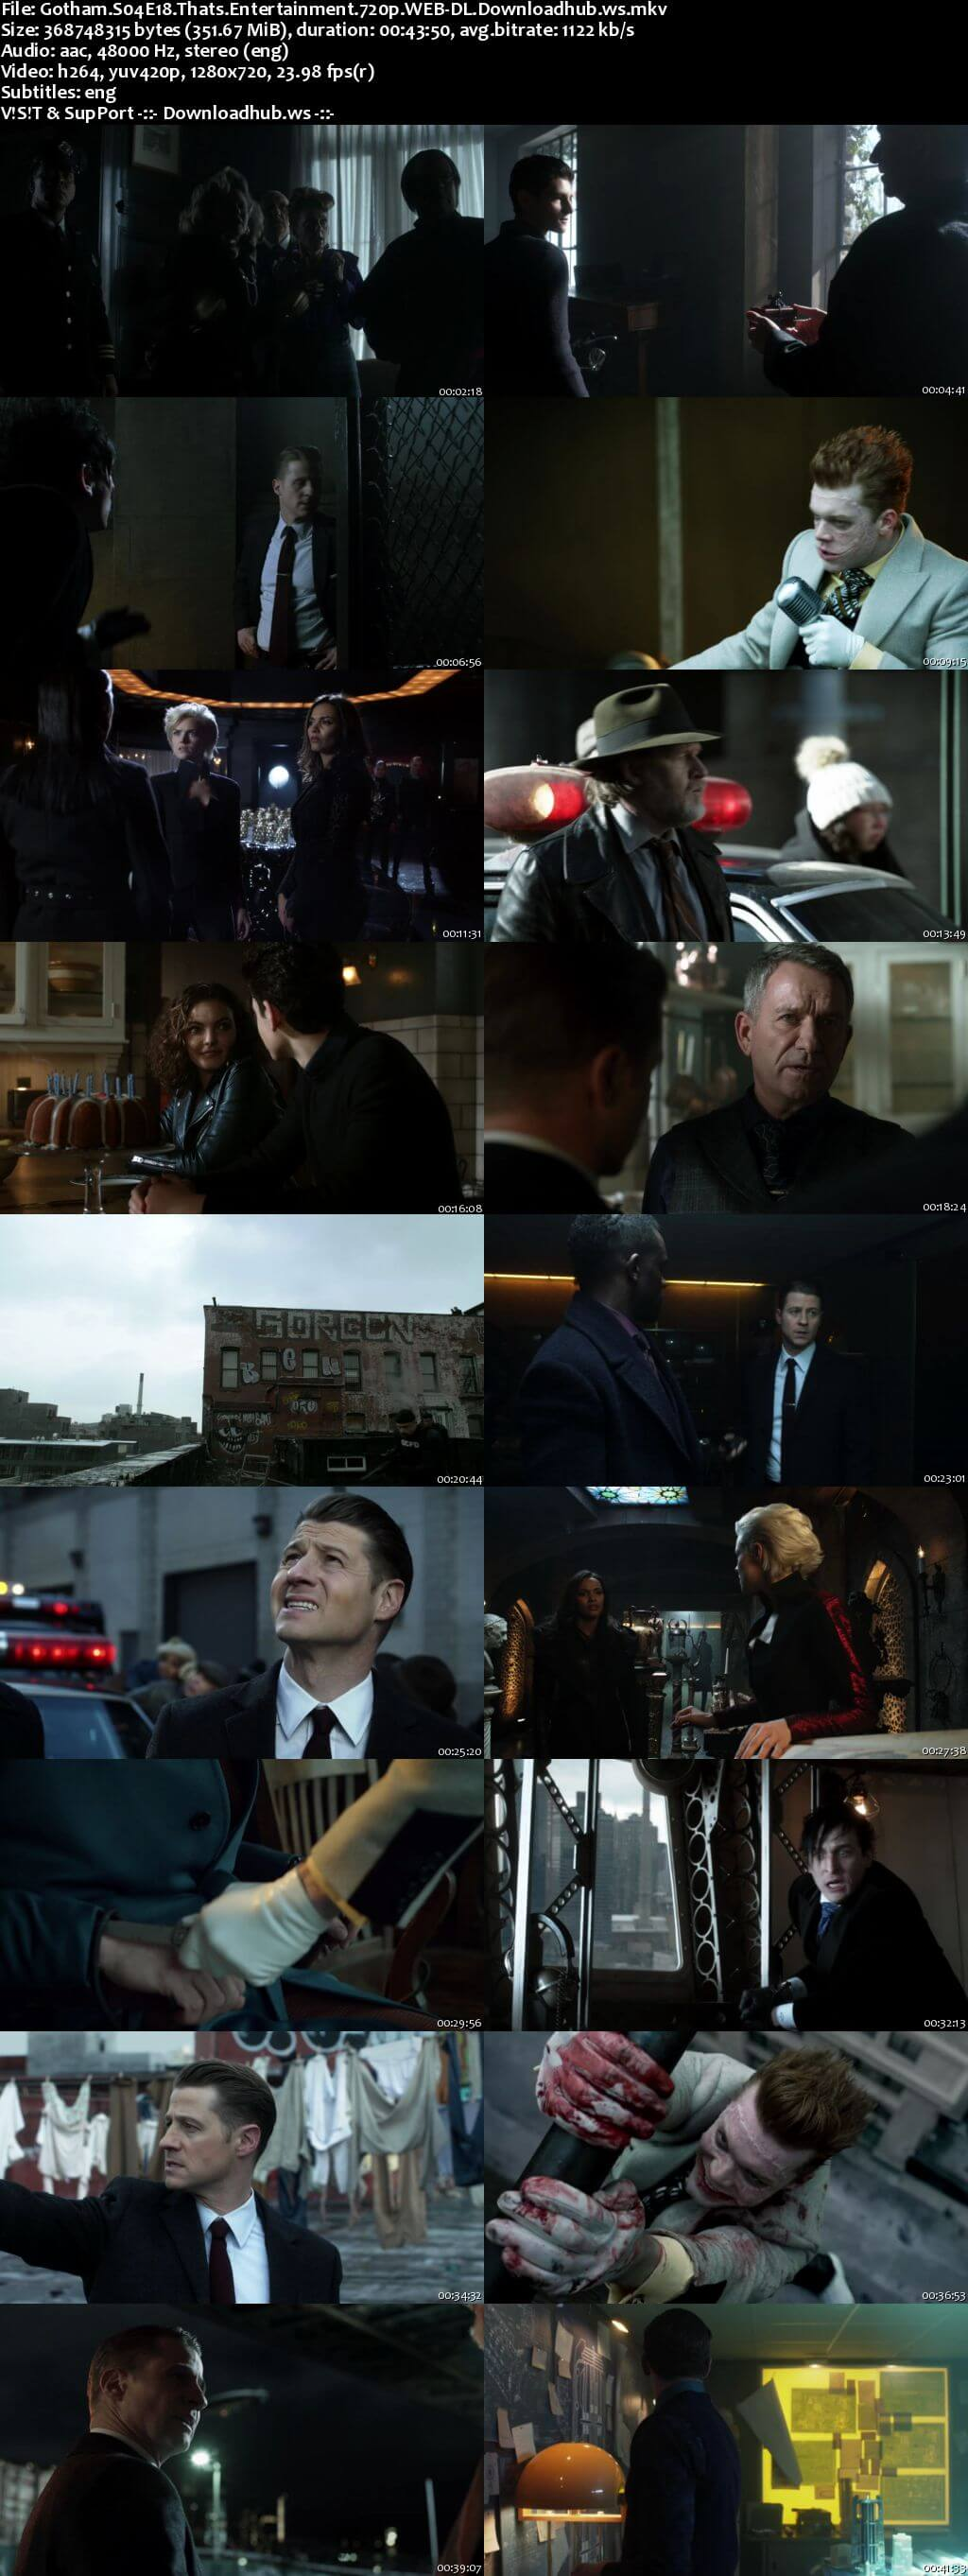 Gotham S04E18 350MB Web-DL 720p x264 ESubs